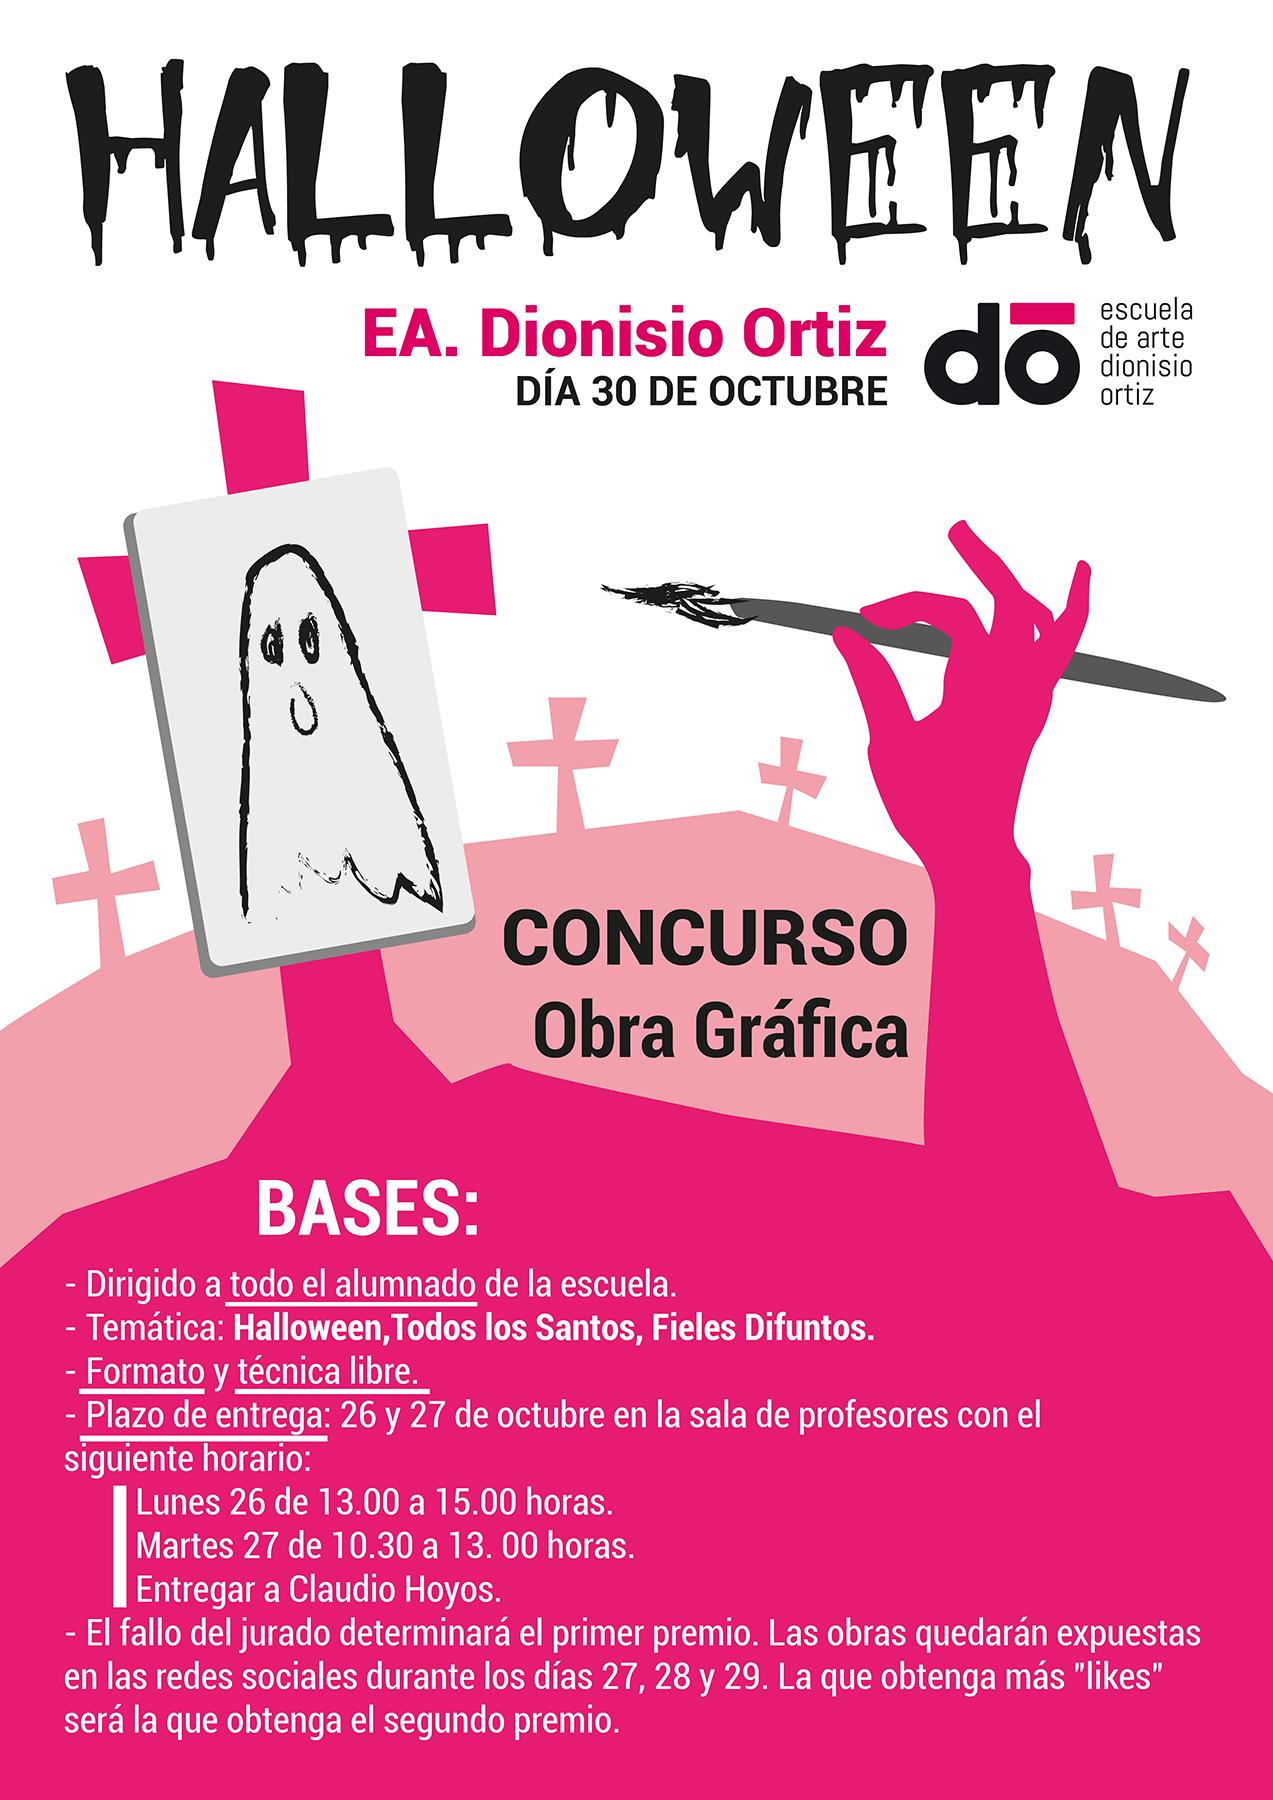 "Convocado concurso para alumnos de Obra Gráfica sobre ""Halloween""."